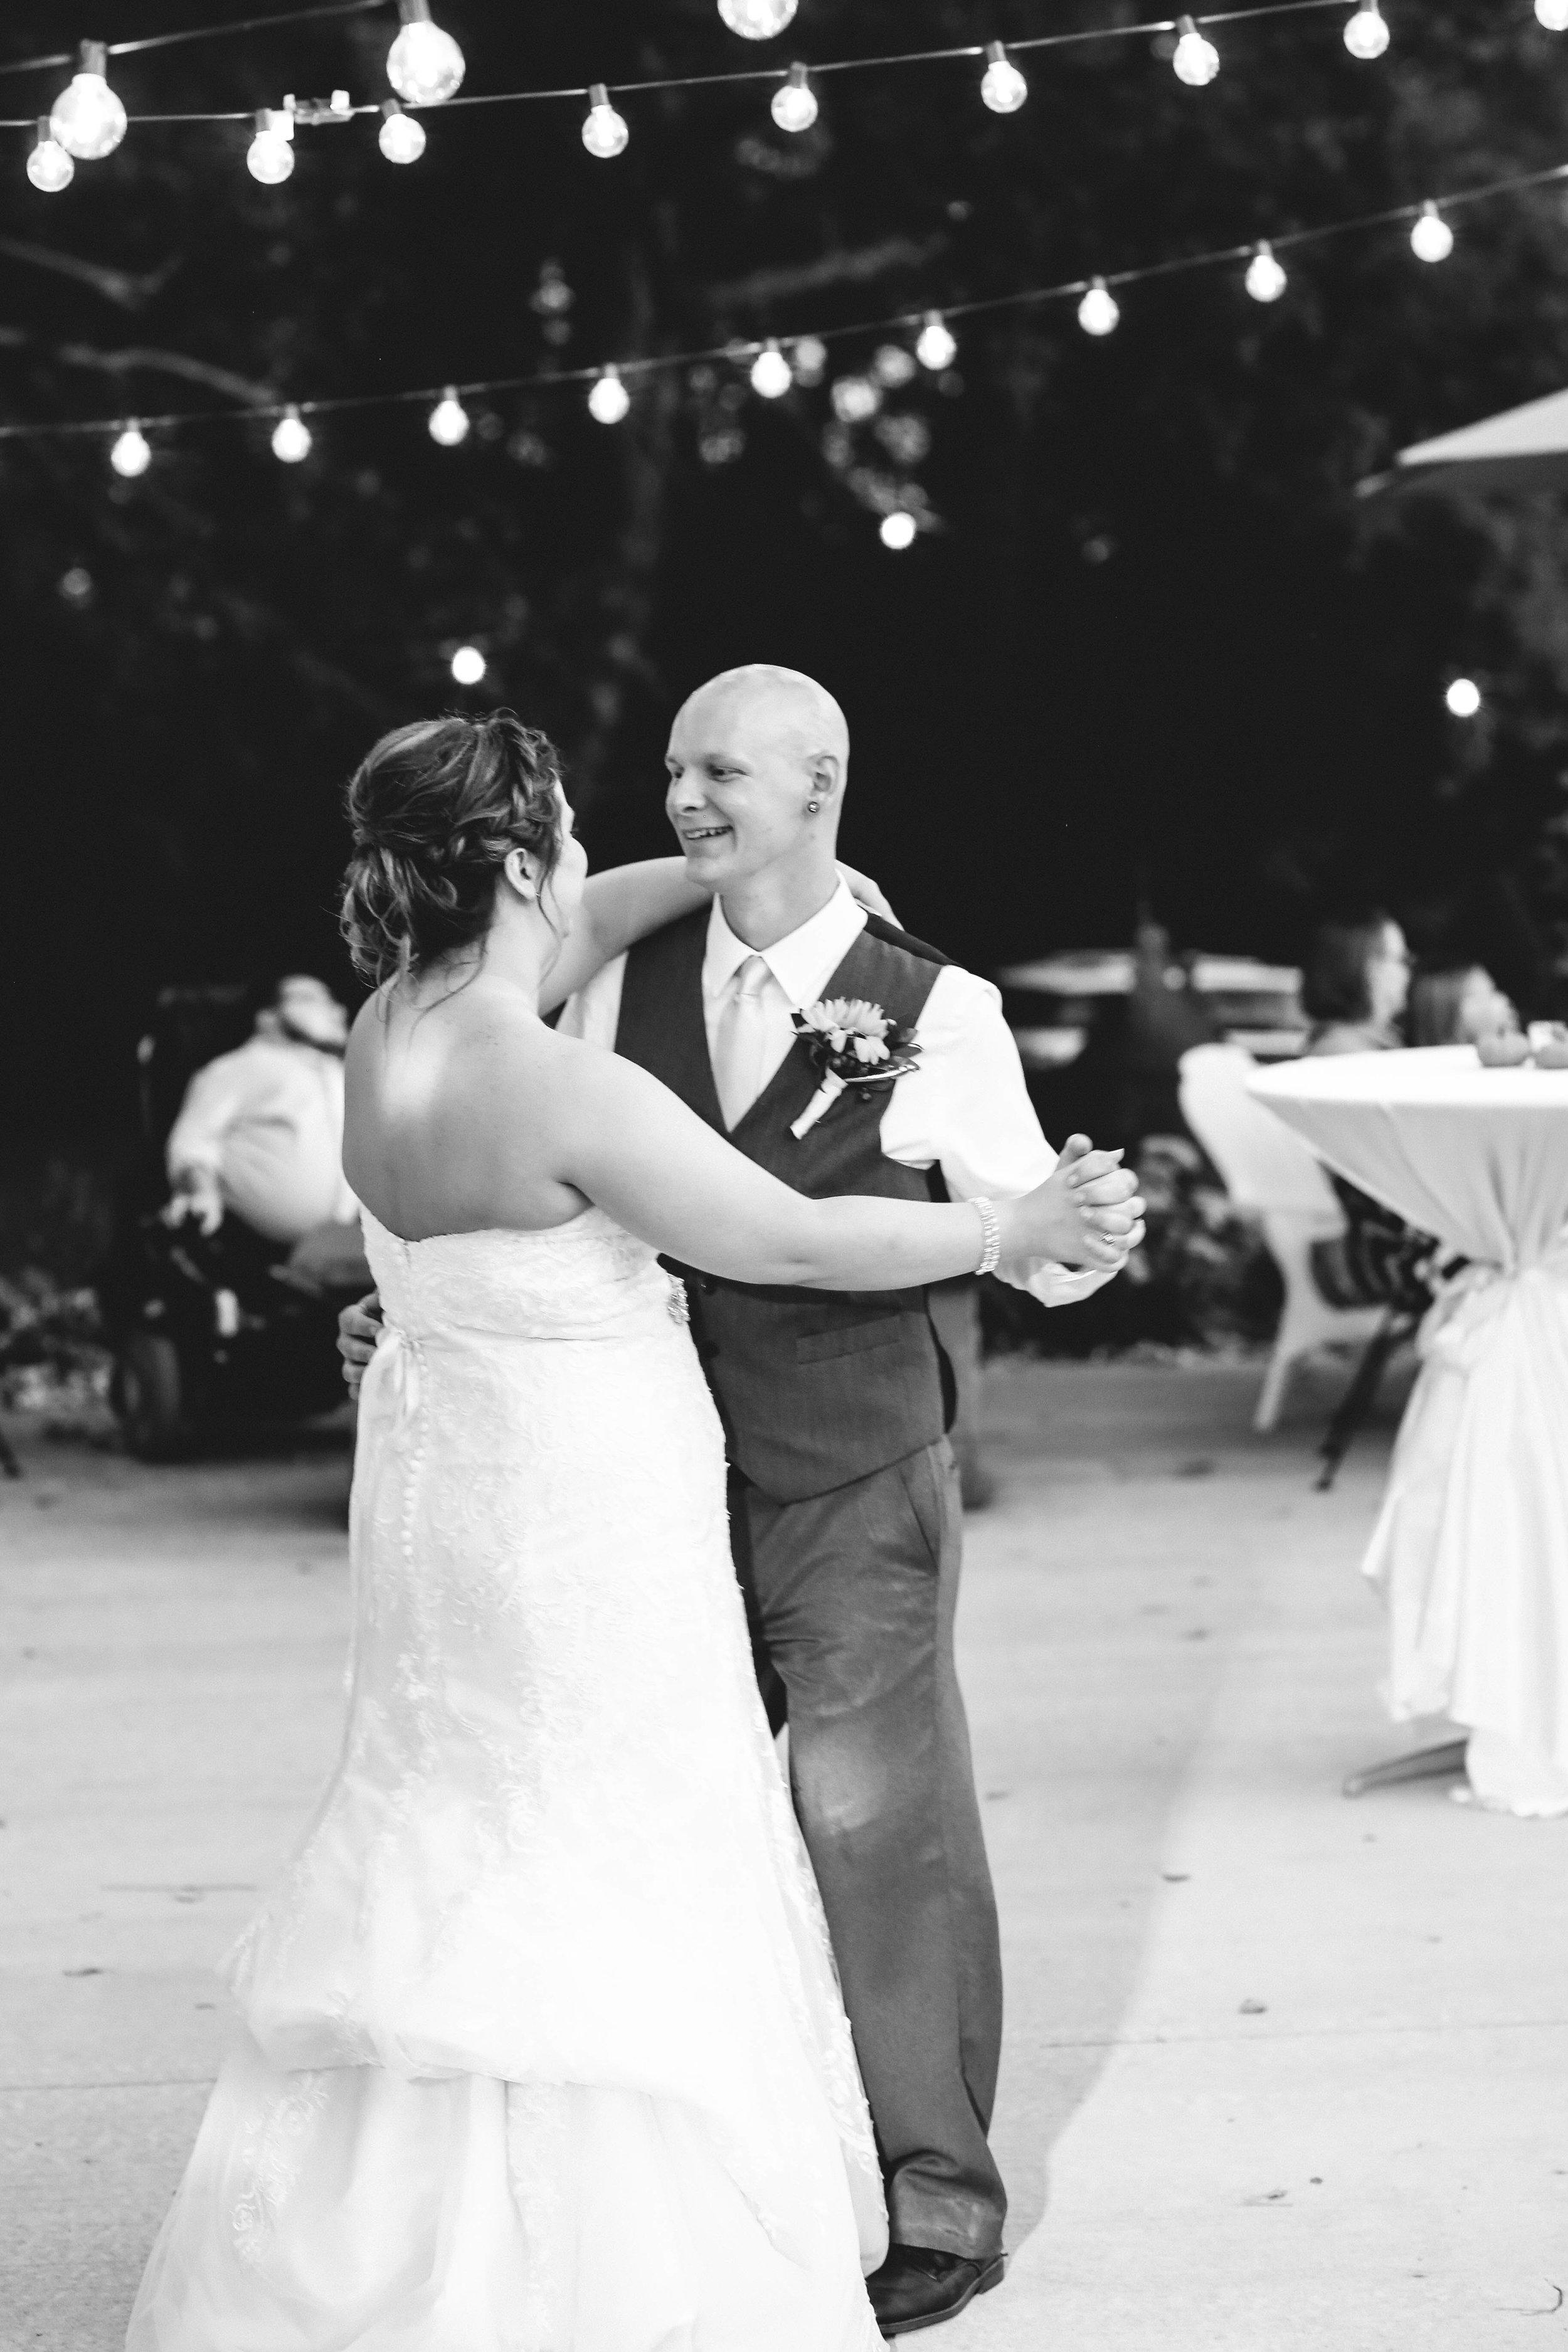 Anthony and Tiffany's Wedding (685 of 693).jpg